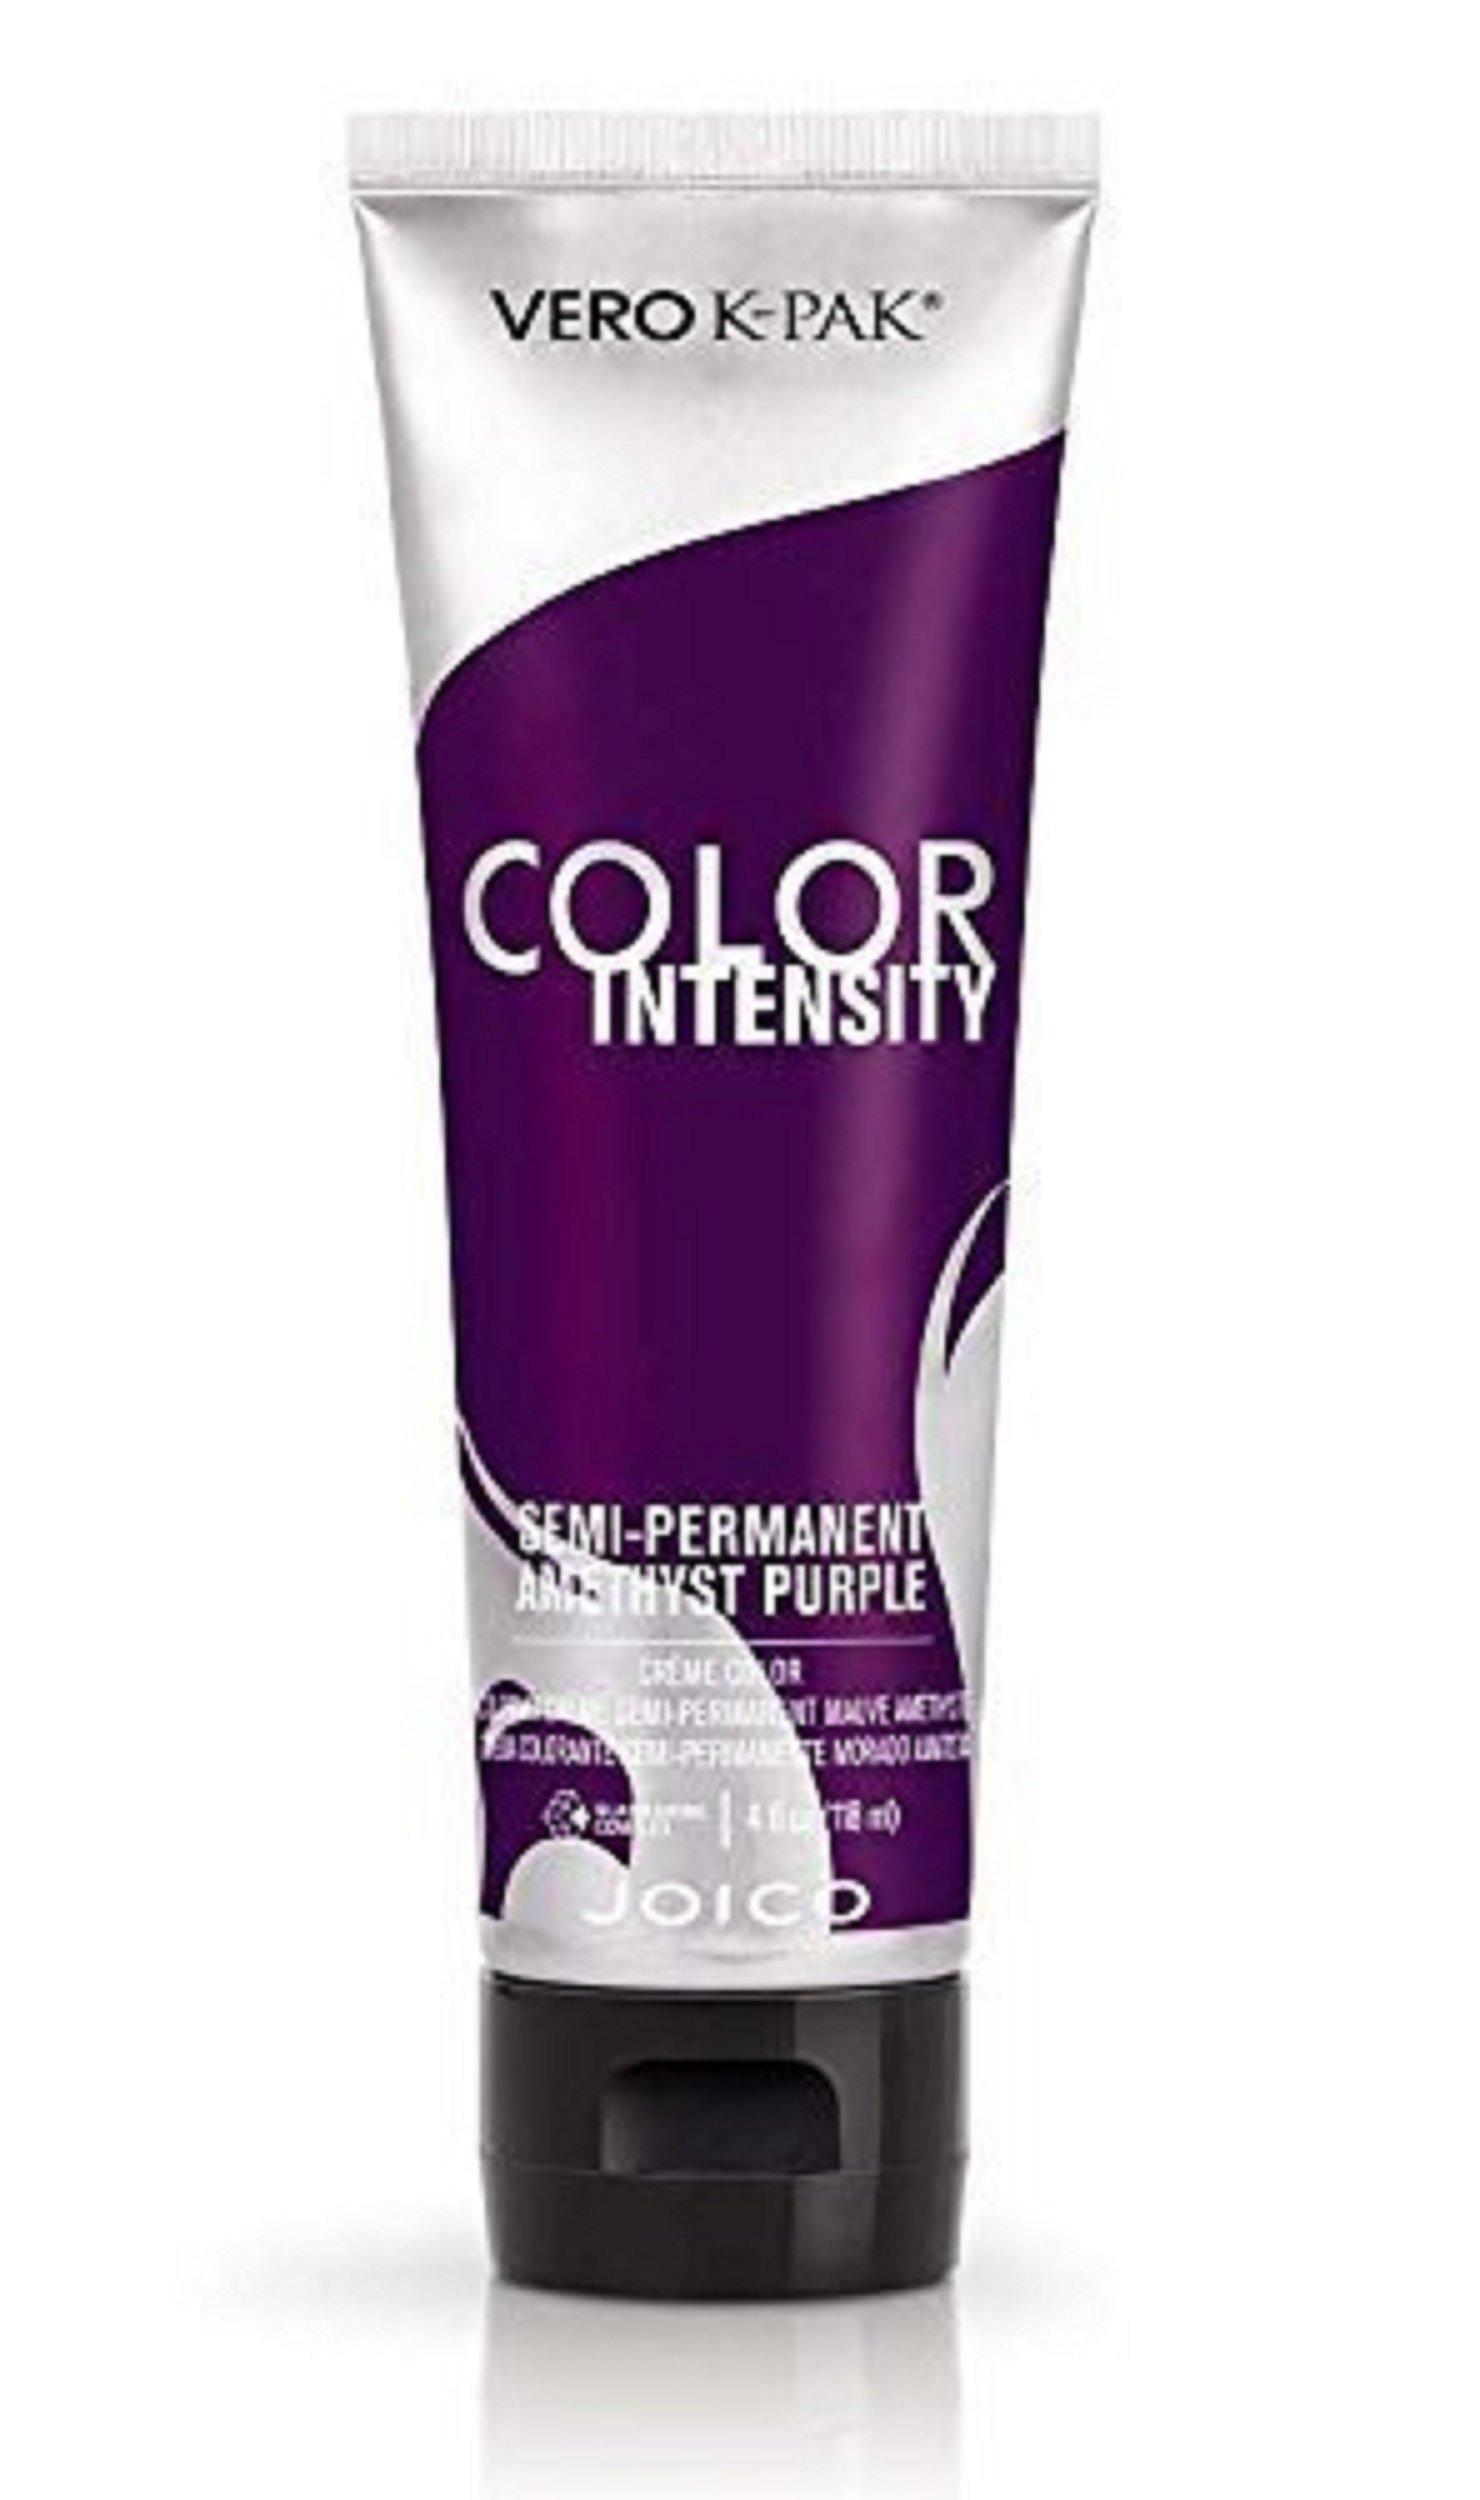 Joico Intensity Semi-Permanent Hair Color, Amethyst Purple, 4 Ounce